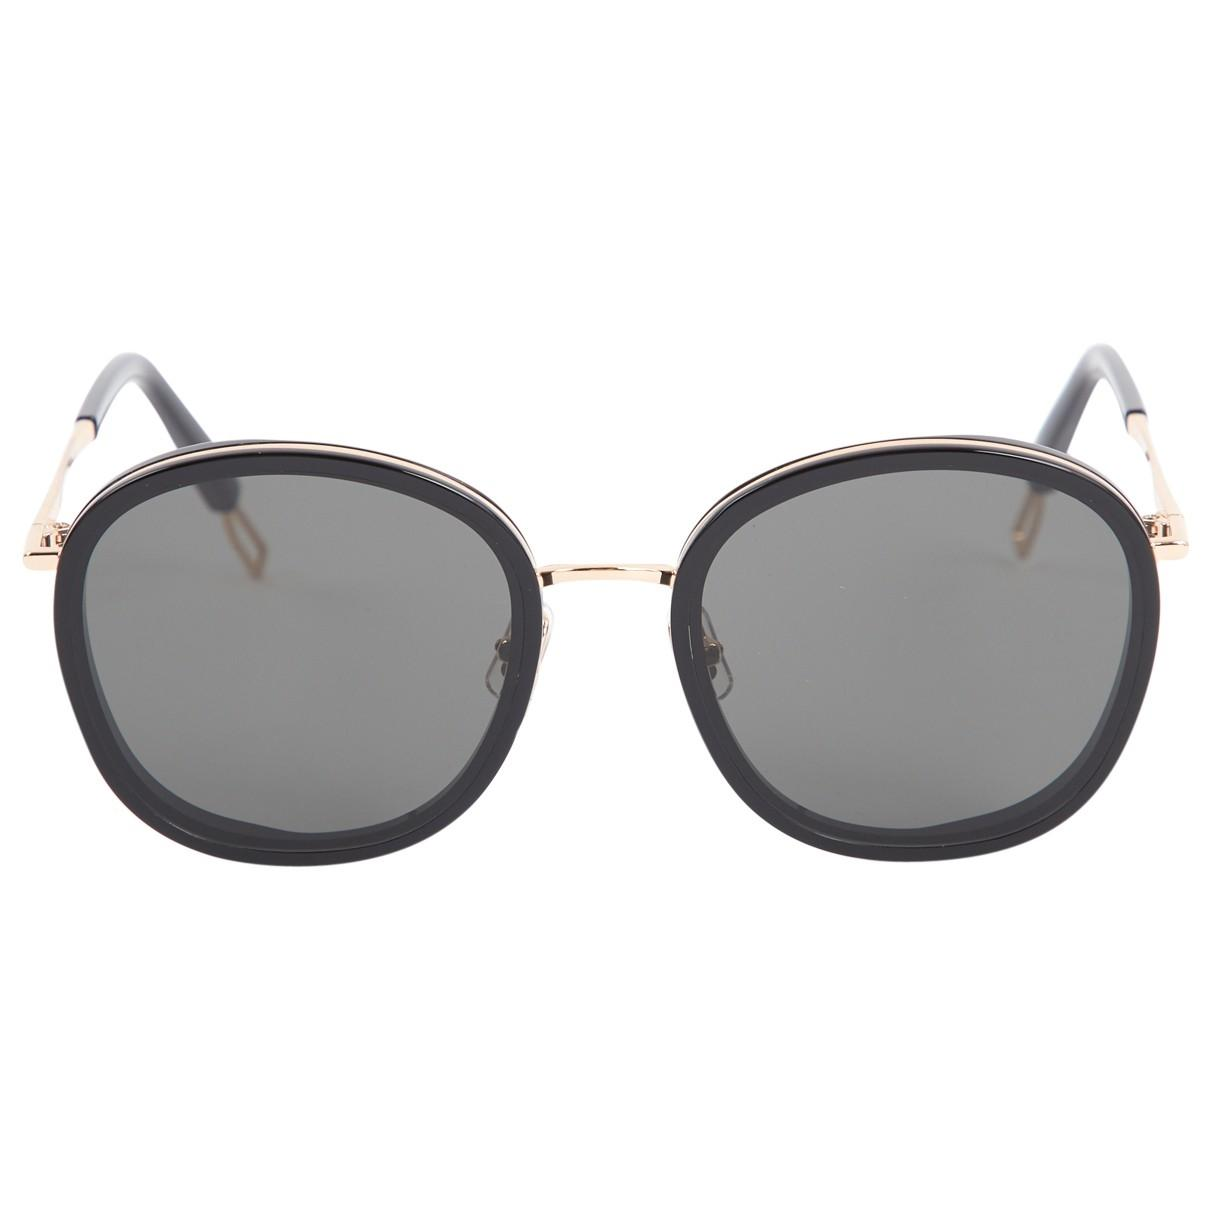 2fc43ba23f80 Lyst - Gentle Monster Black Plastic Sunglasses in Black